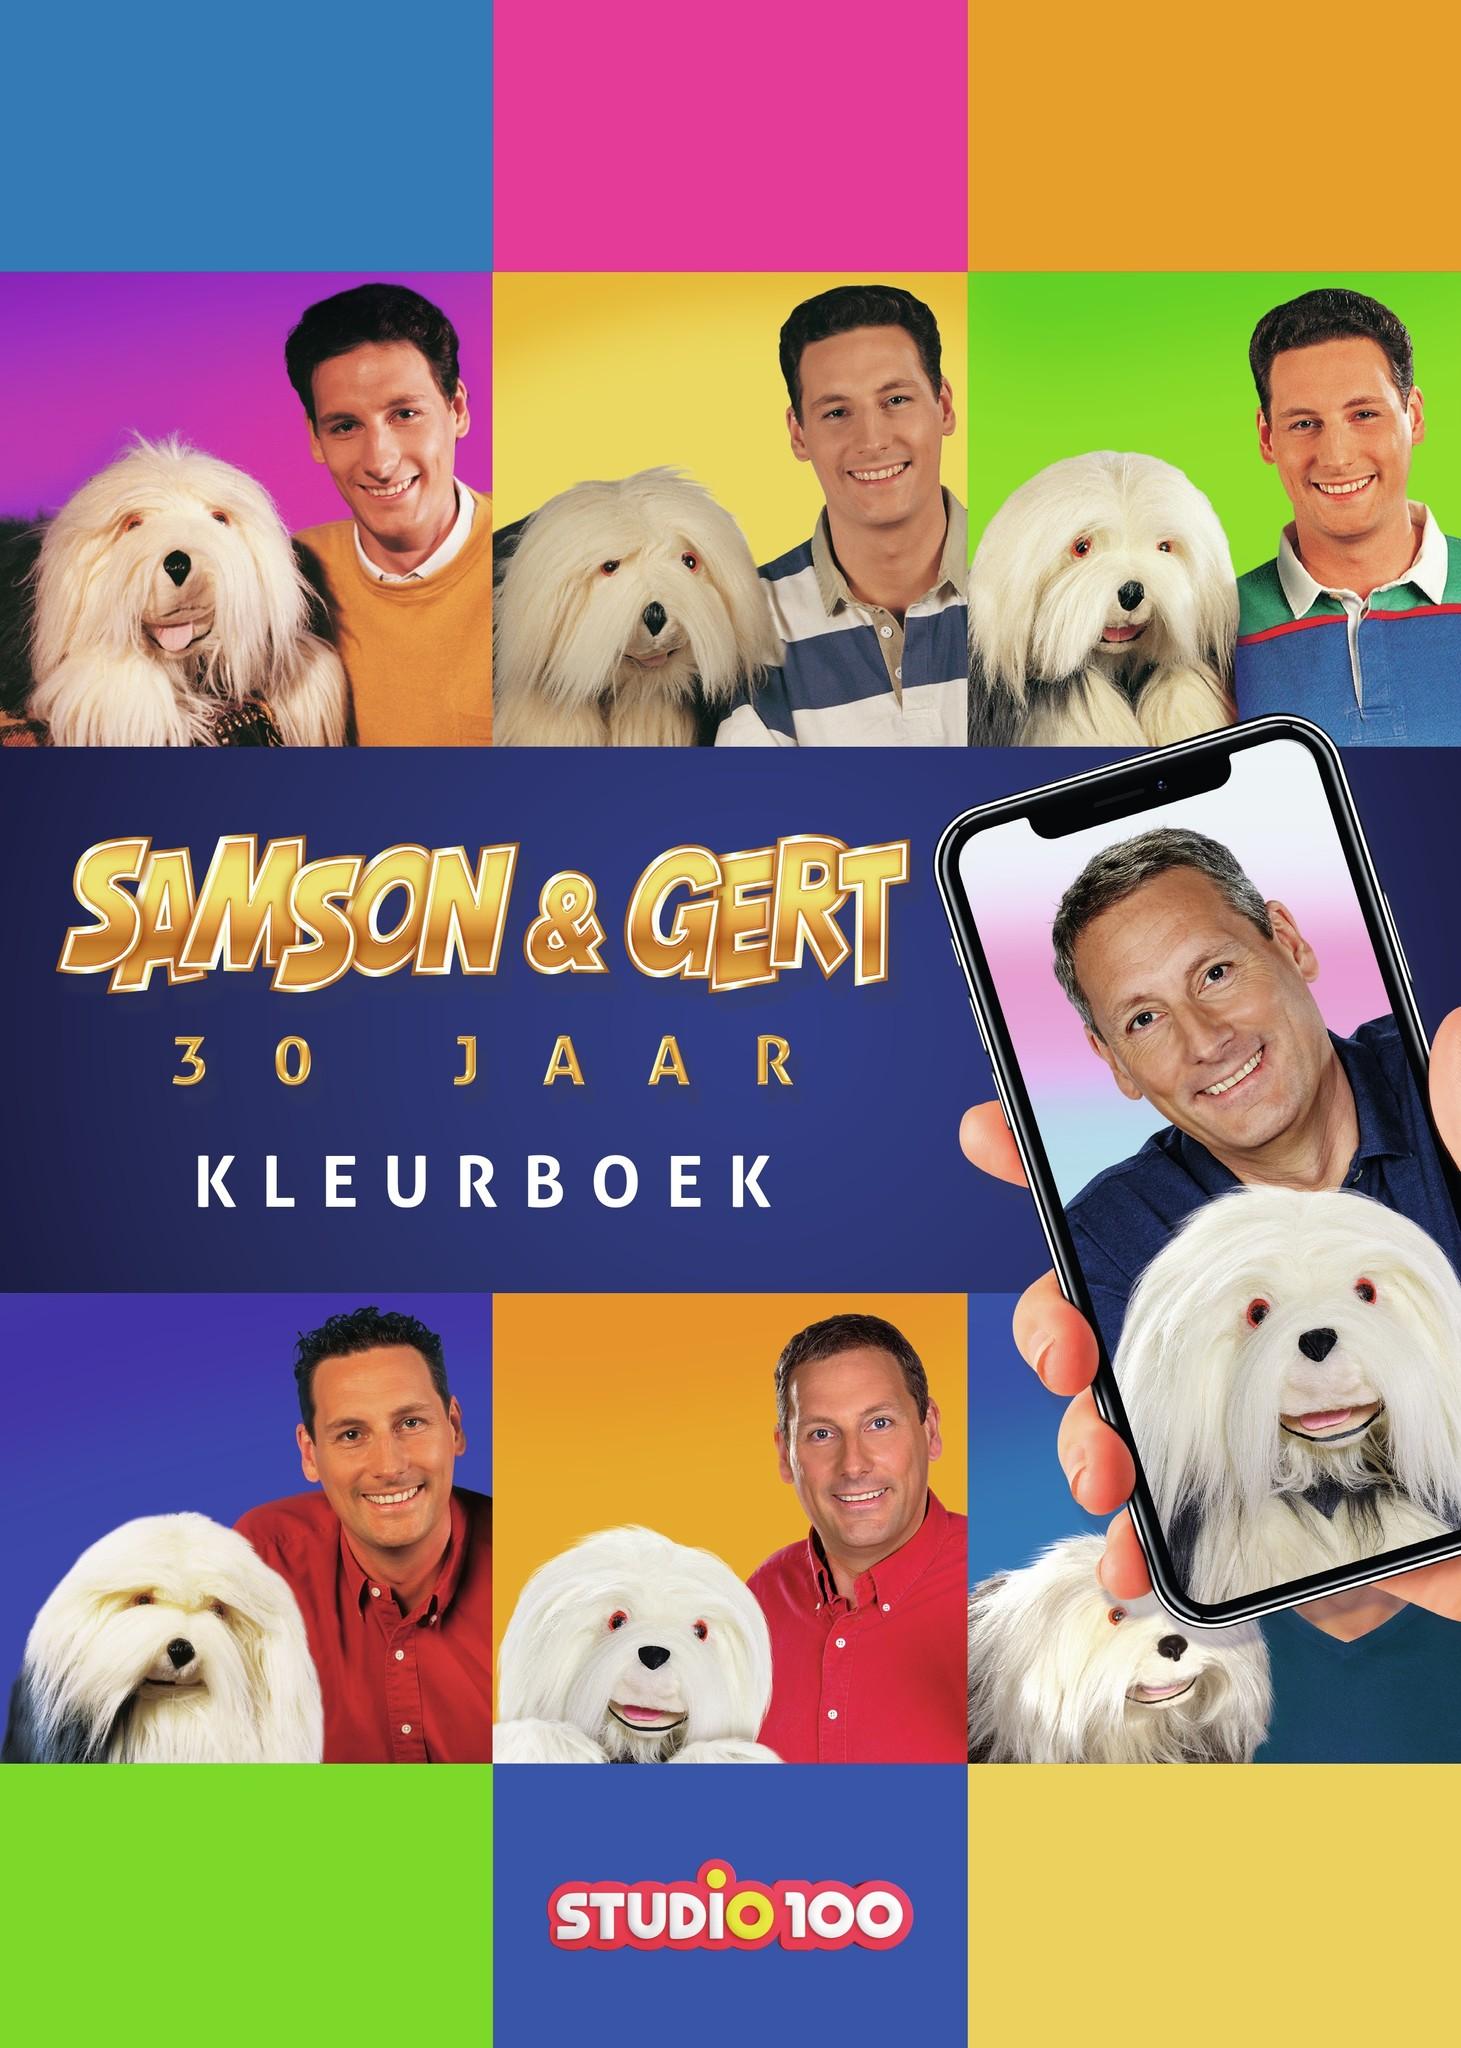 Coloriage Samson et Gert : 30 ans Samson et Gert